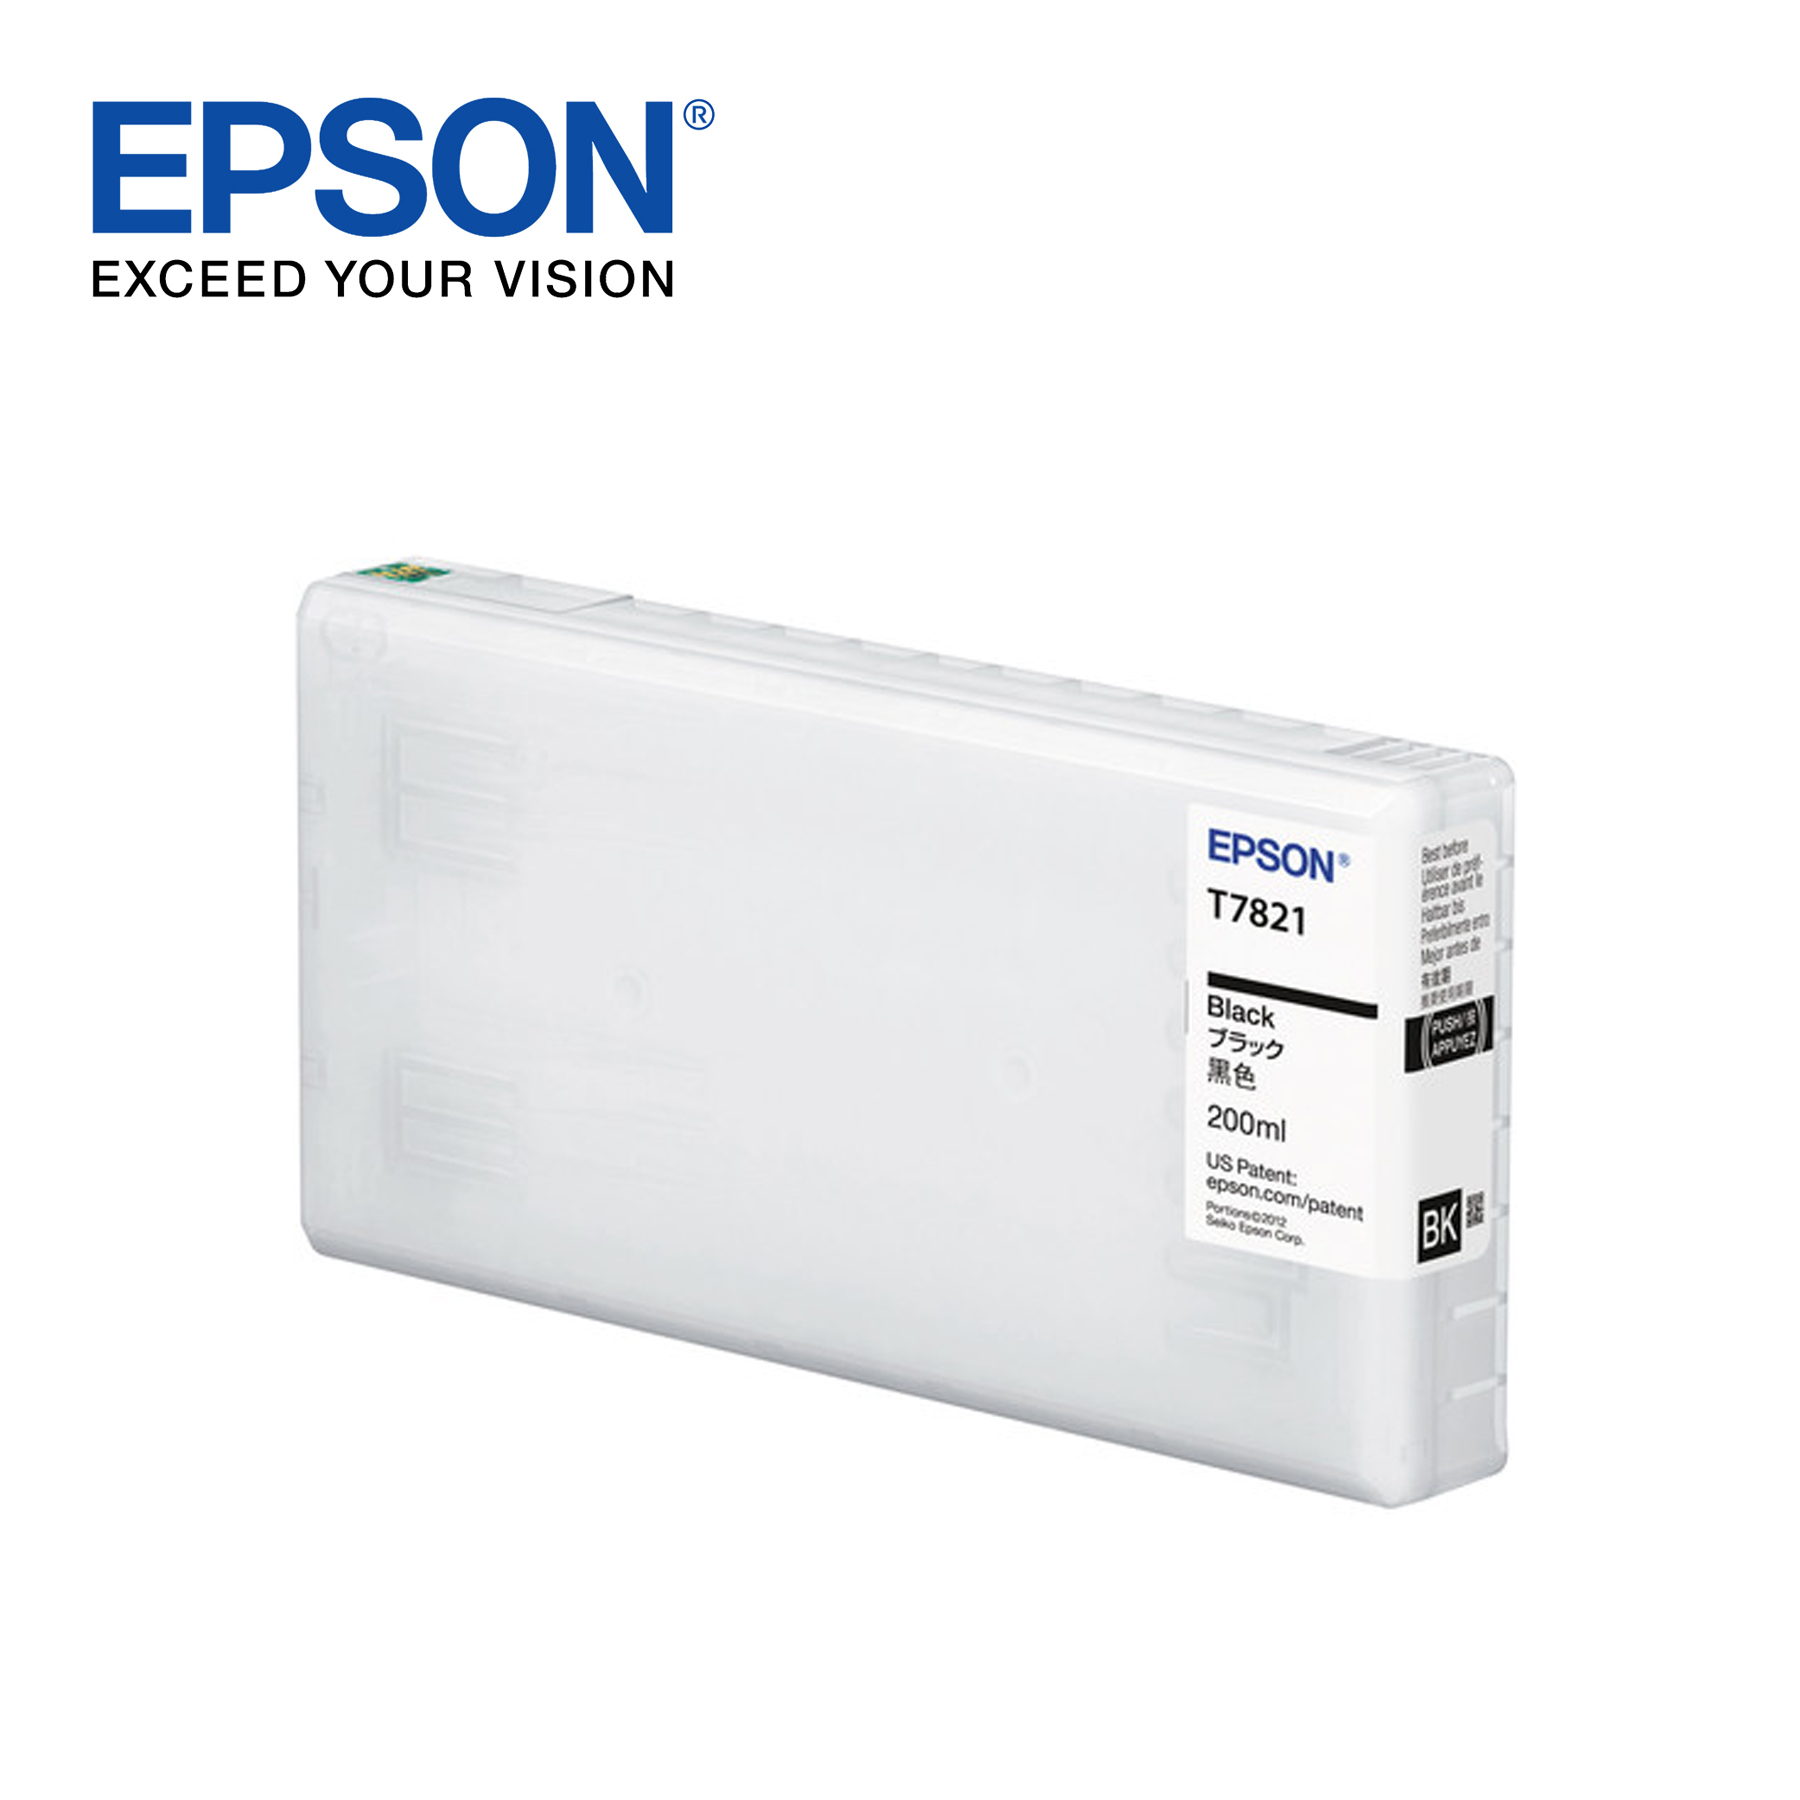 Epson Ink Cartridge for Surelab SL-D700 Photo Printer – Black